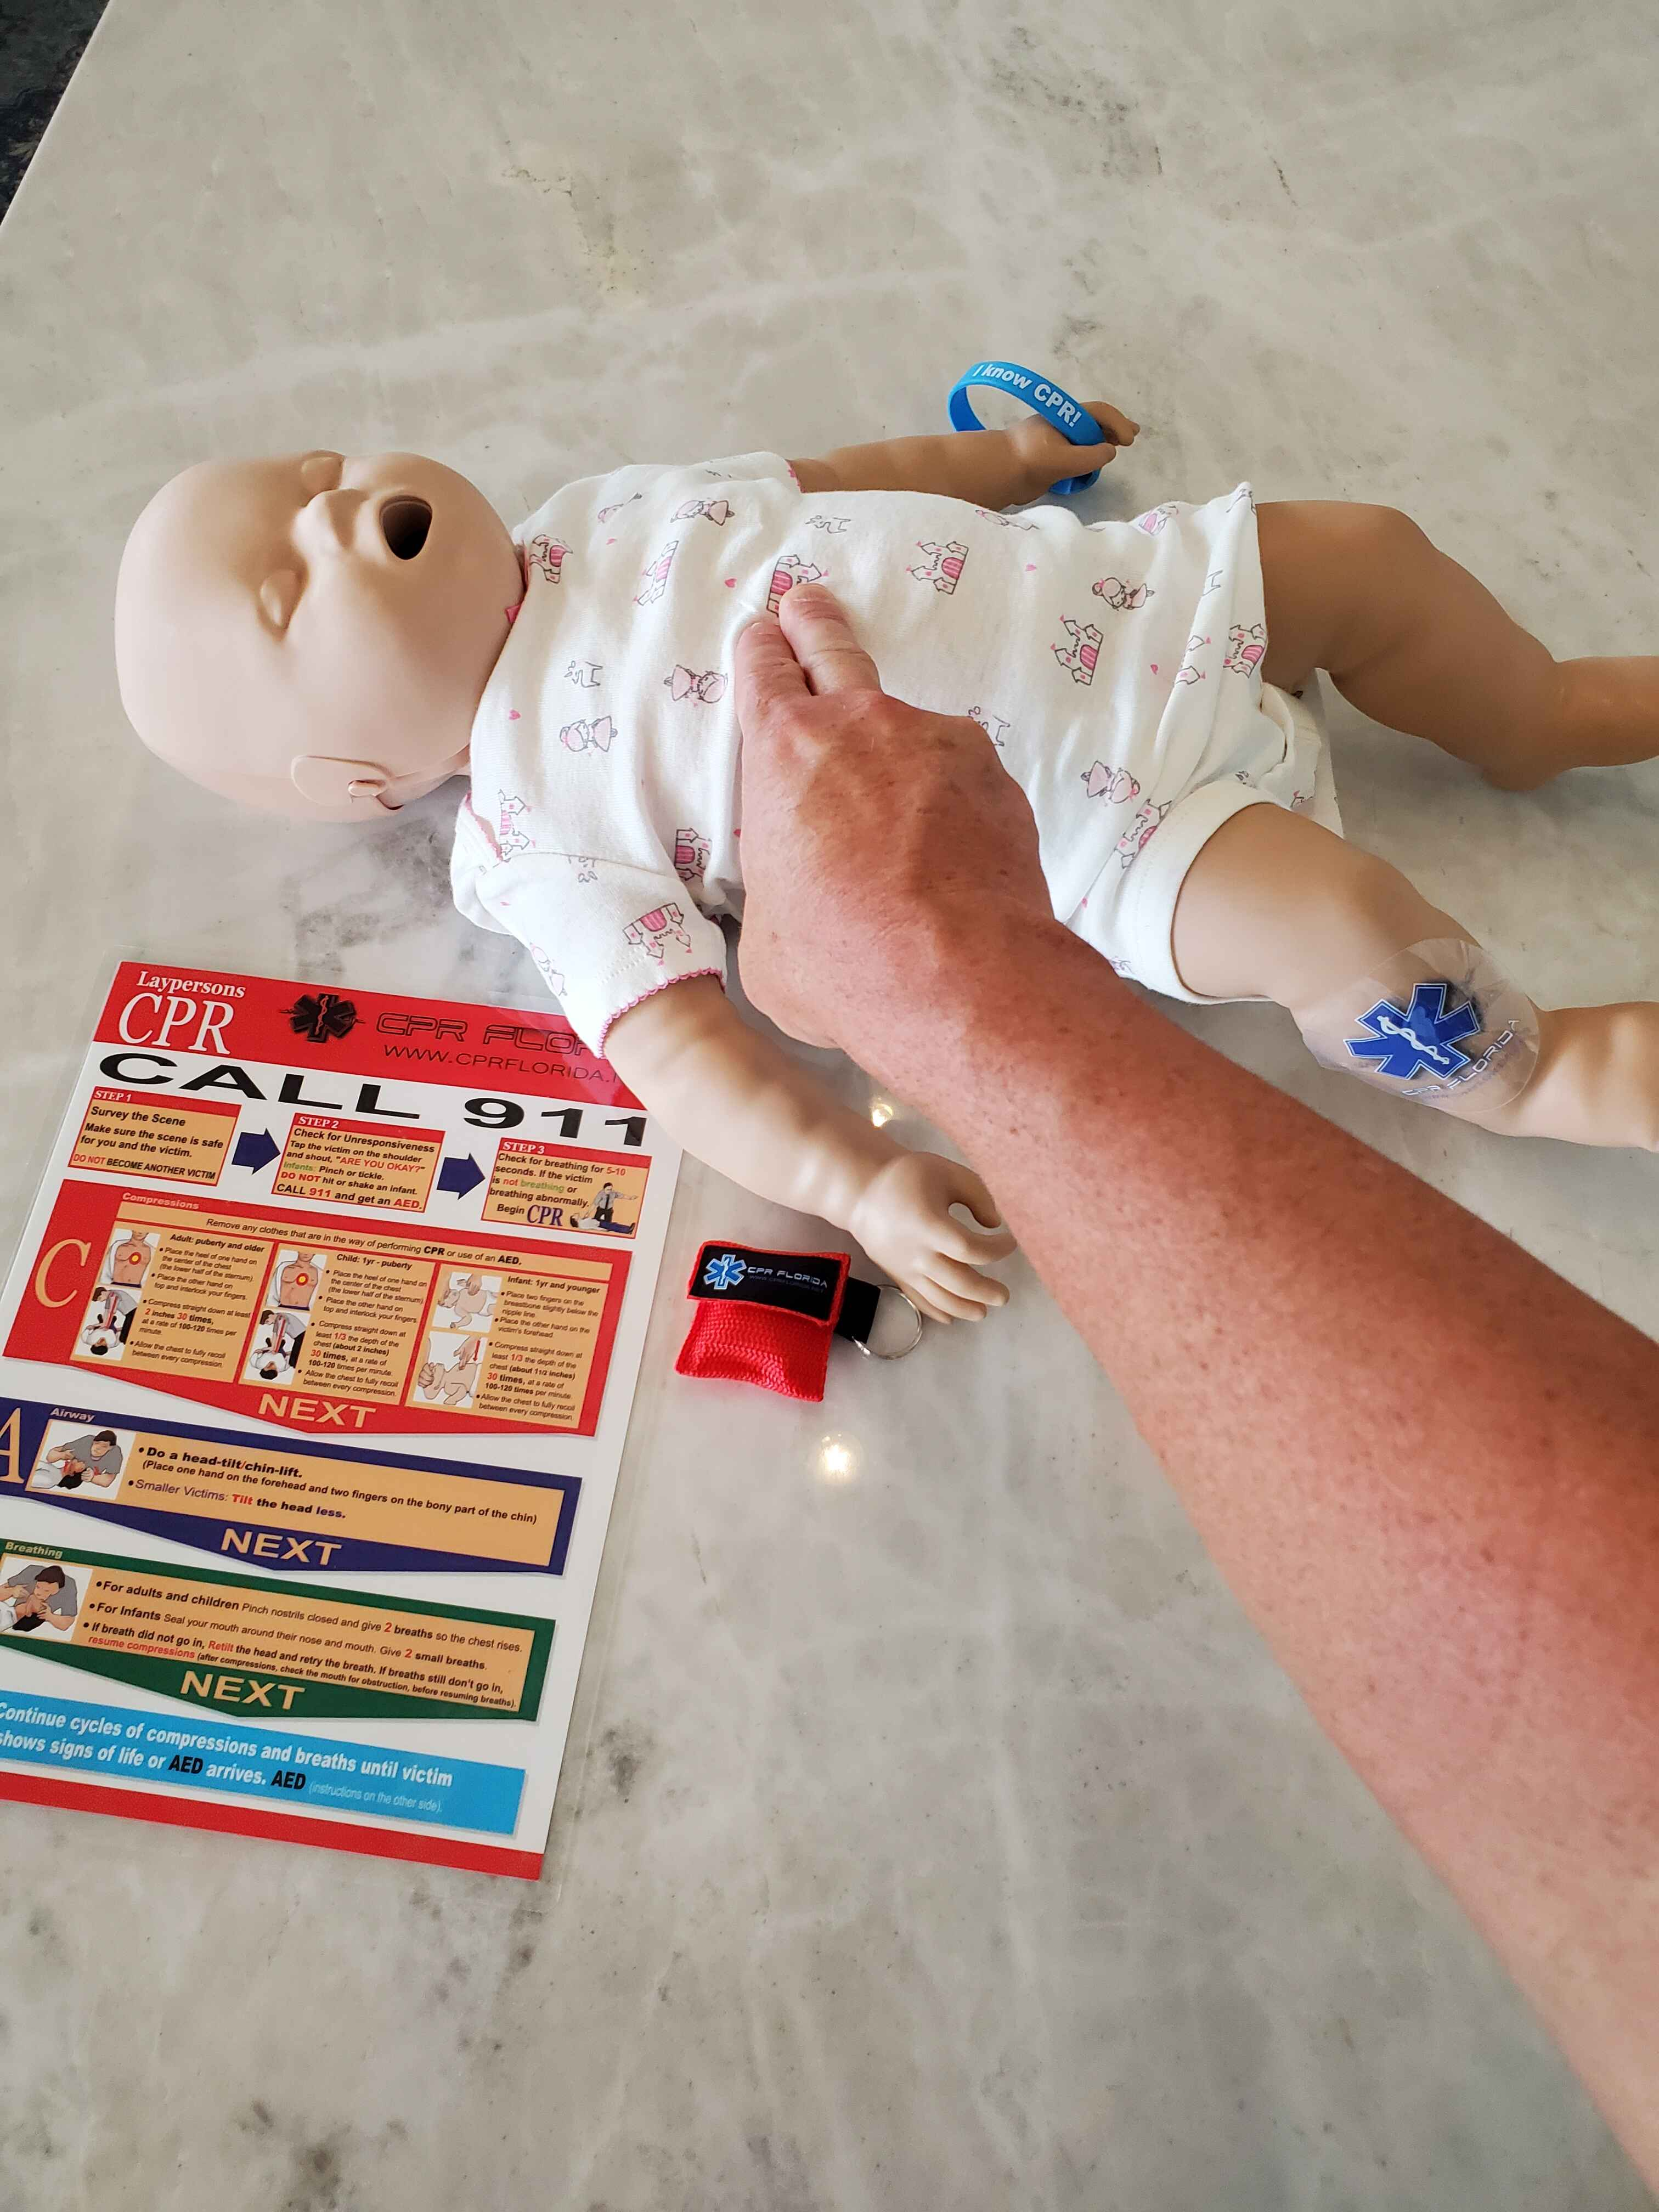 infant cpr certification classes